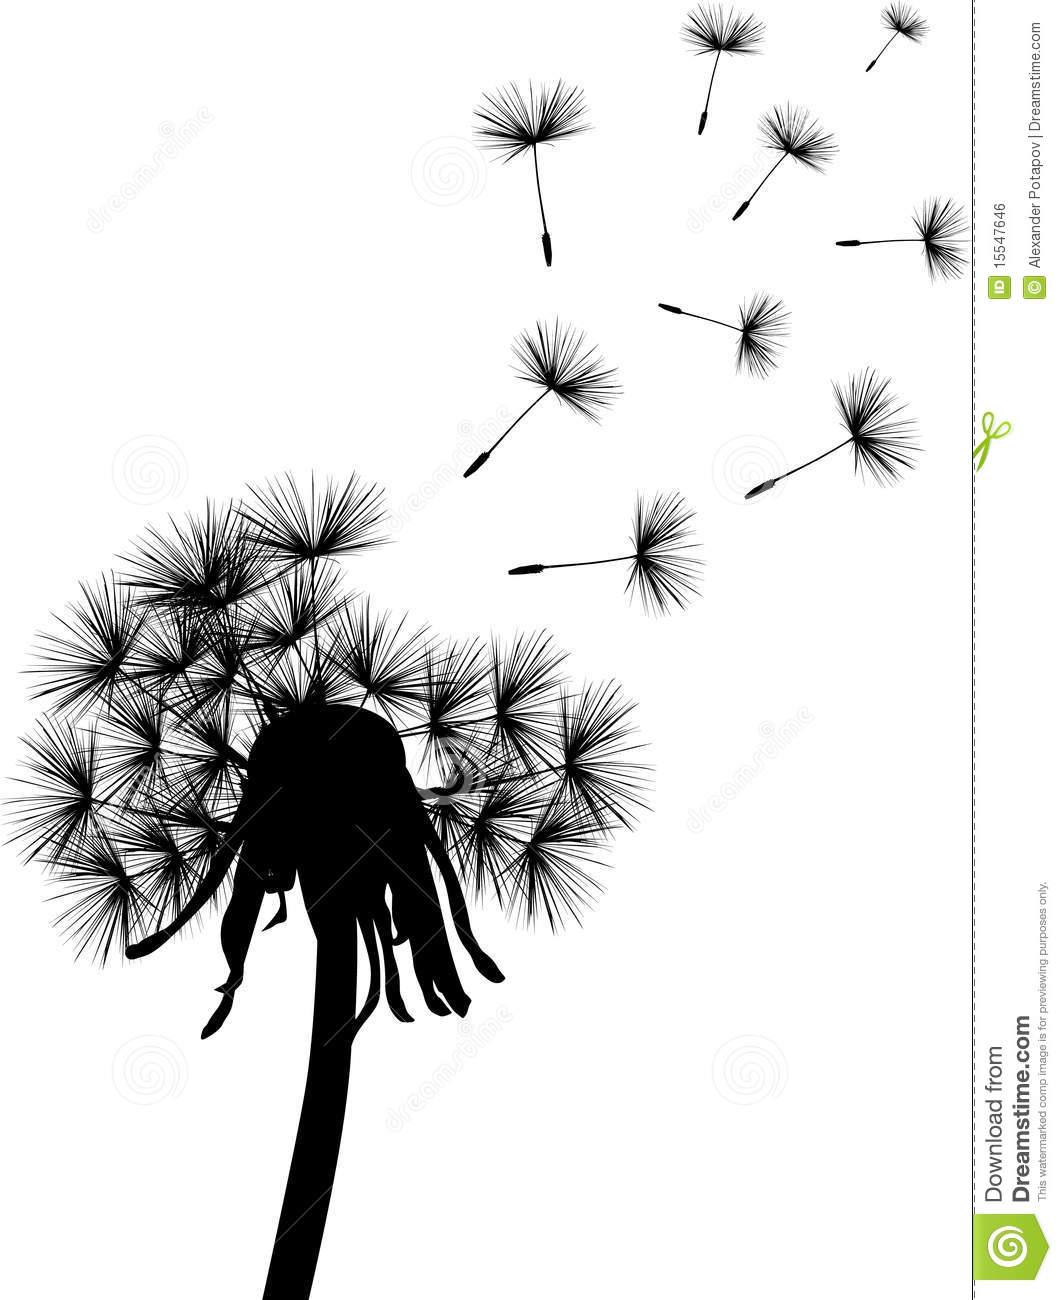 Dandelion Black And White Wallpaper Black dandelion plant 1062x1300